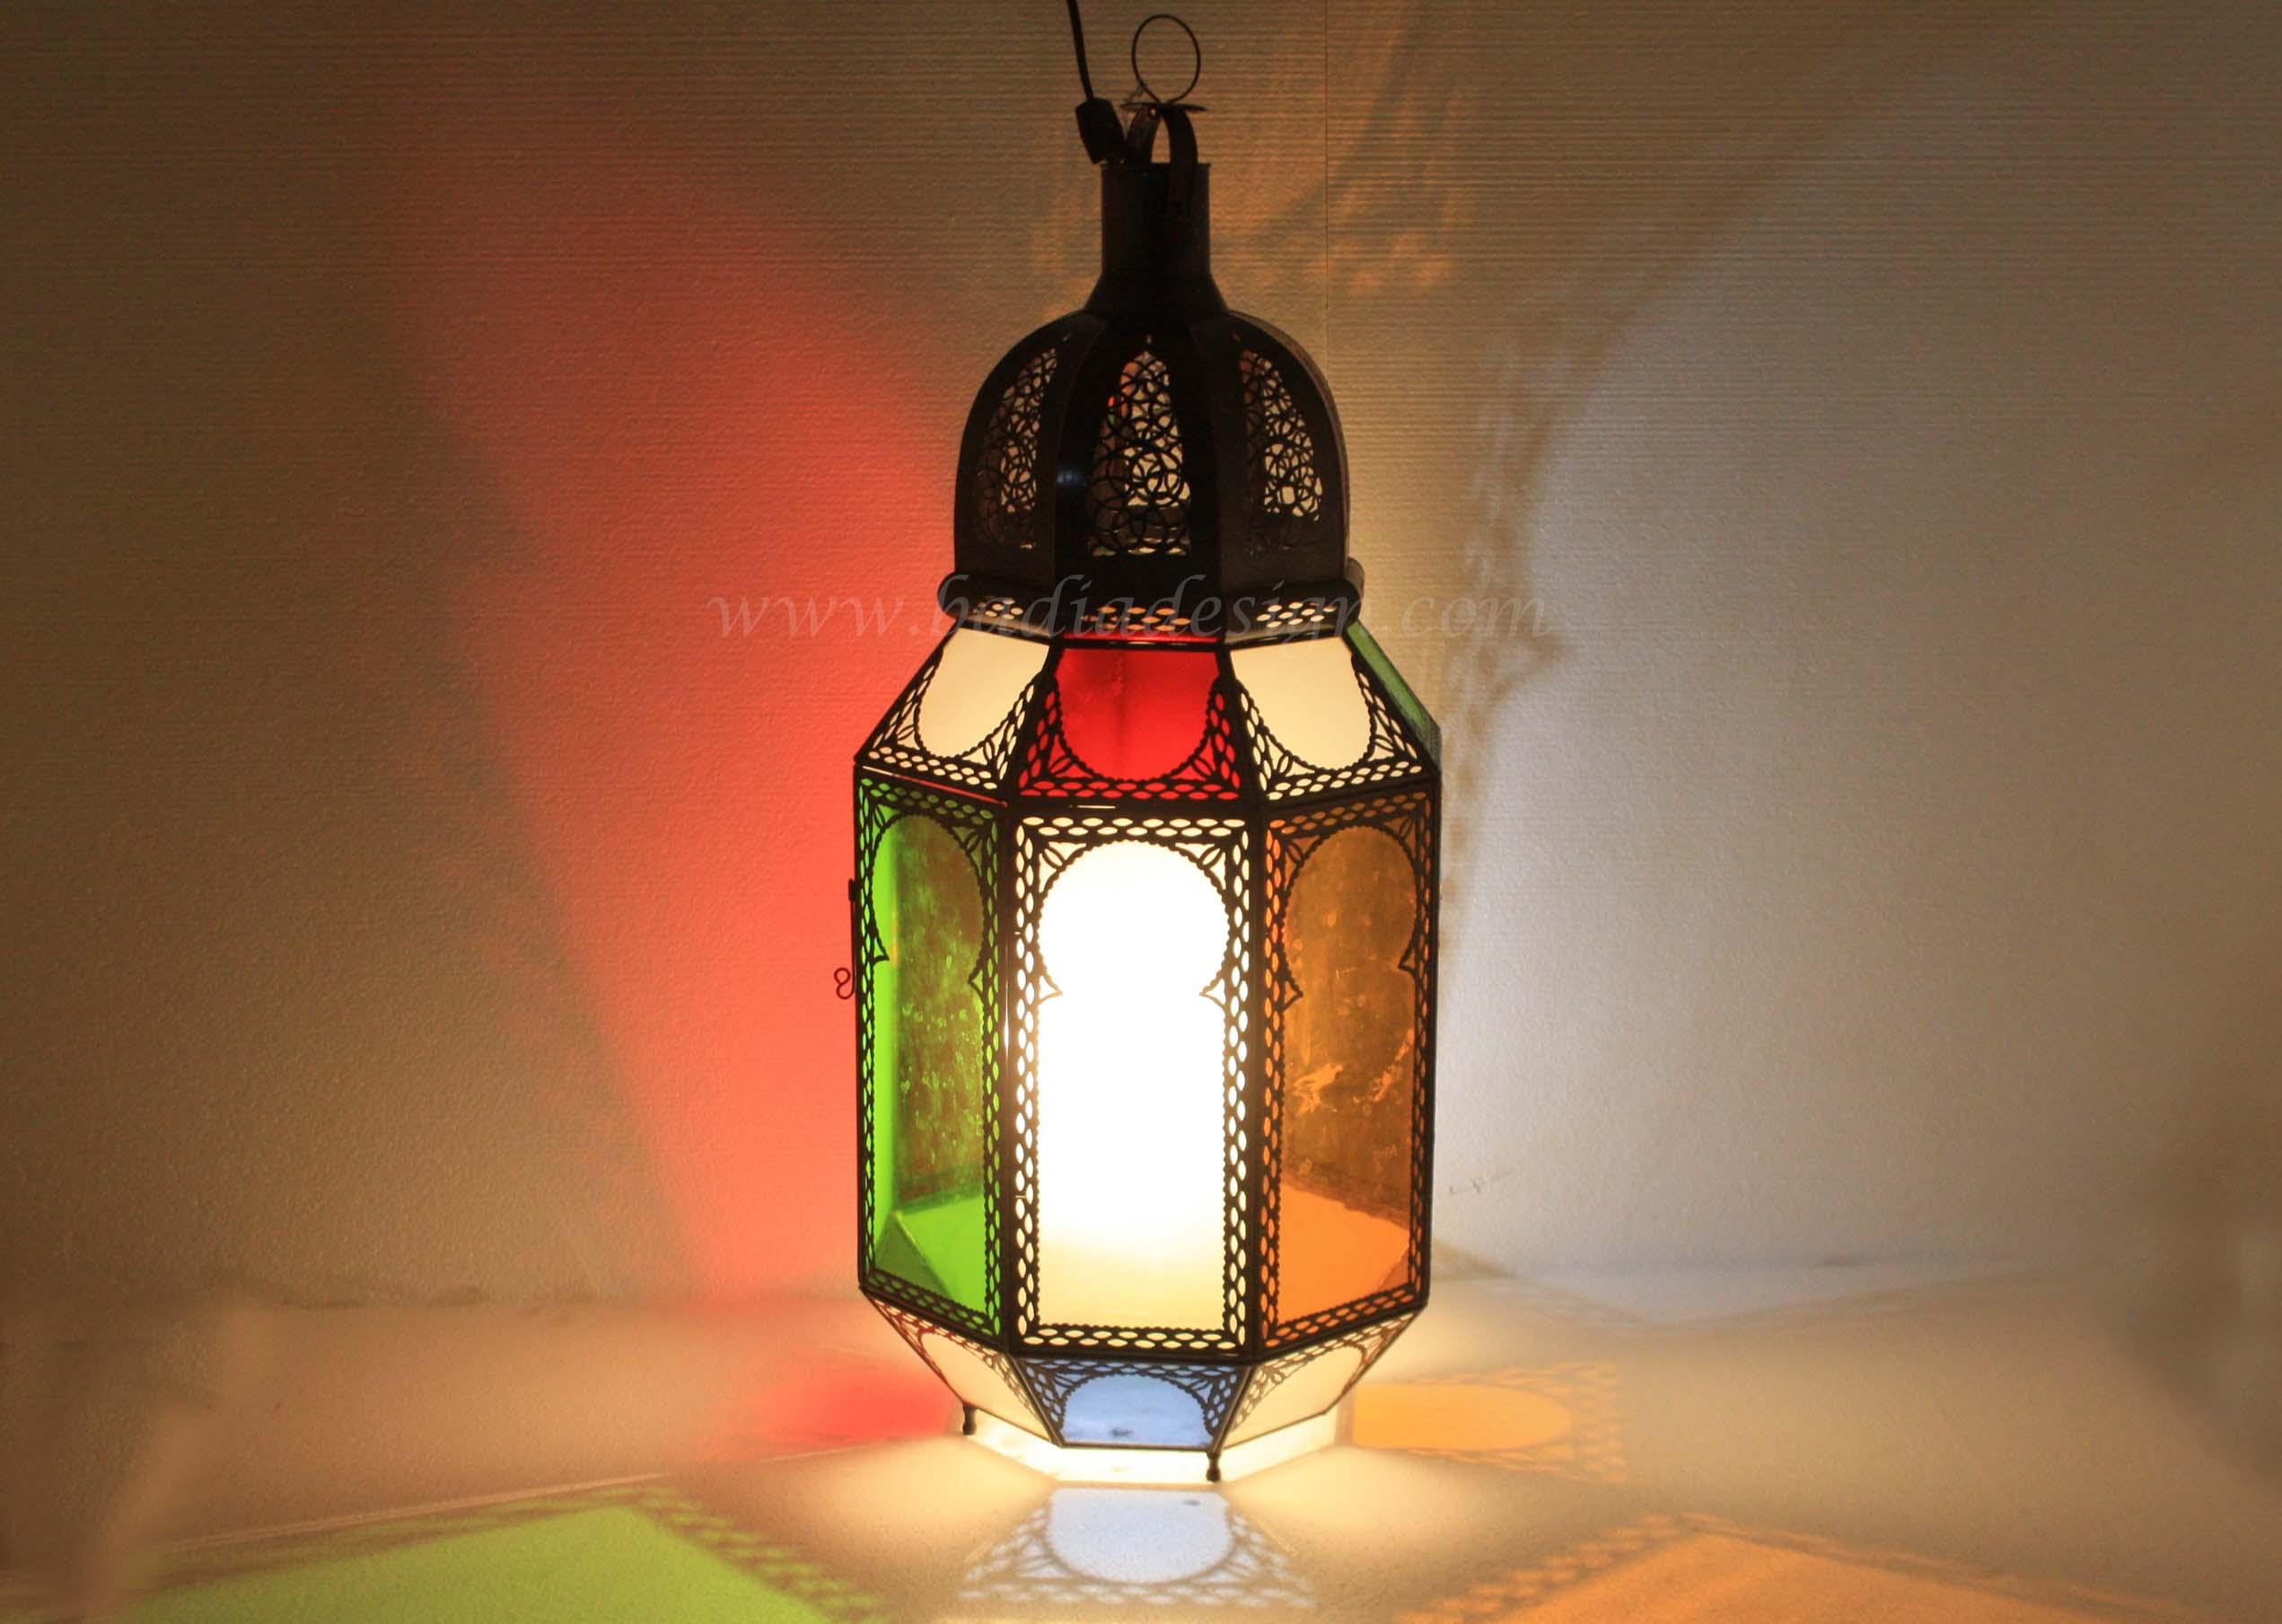 moroccan-floor-lantern-los-angeles-lig292-1.jpg